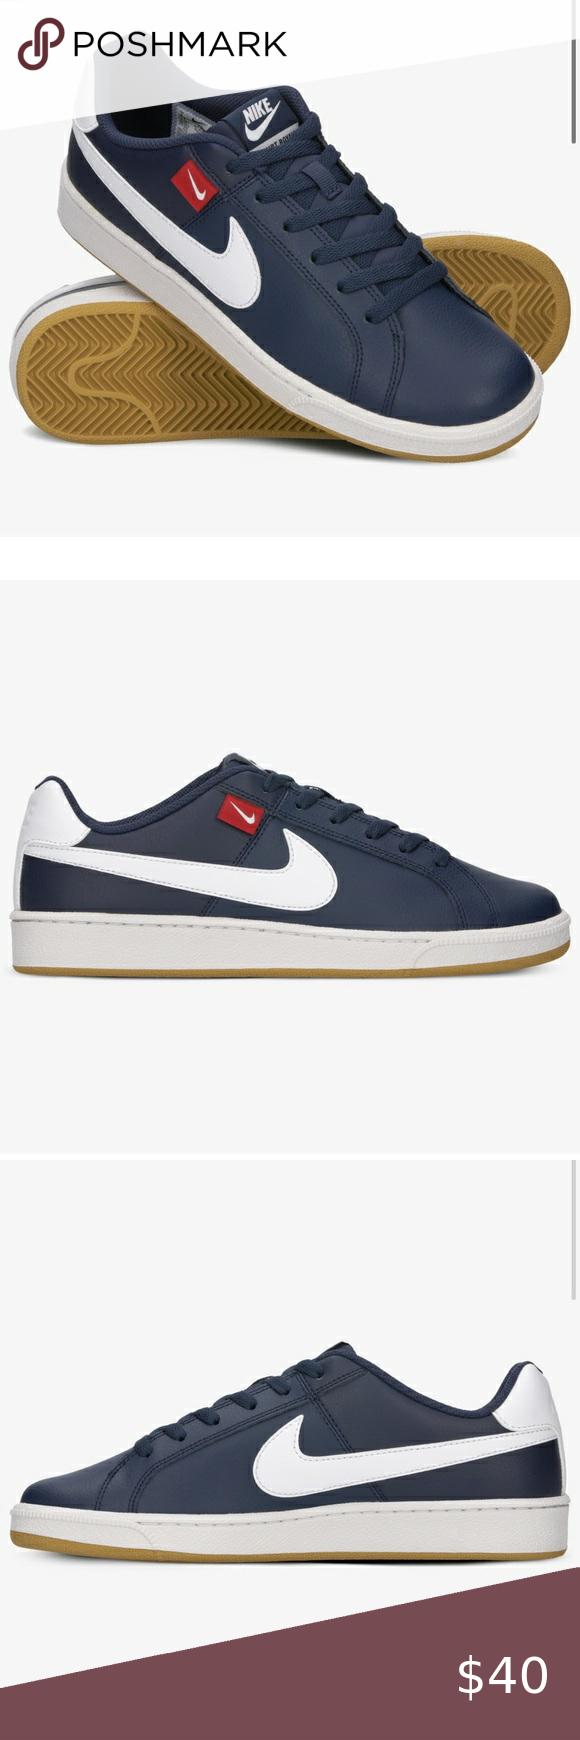 Shuraba caminar desencadenar  NEW Nike Men's Court Royale Tab Navy Blue | Navy blue sneakers, Nike men,  Blue sneakers